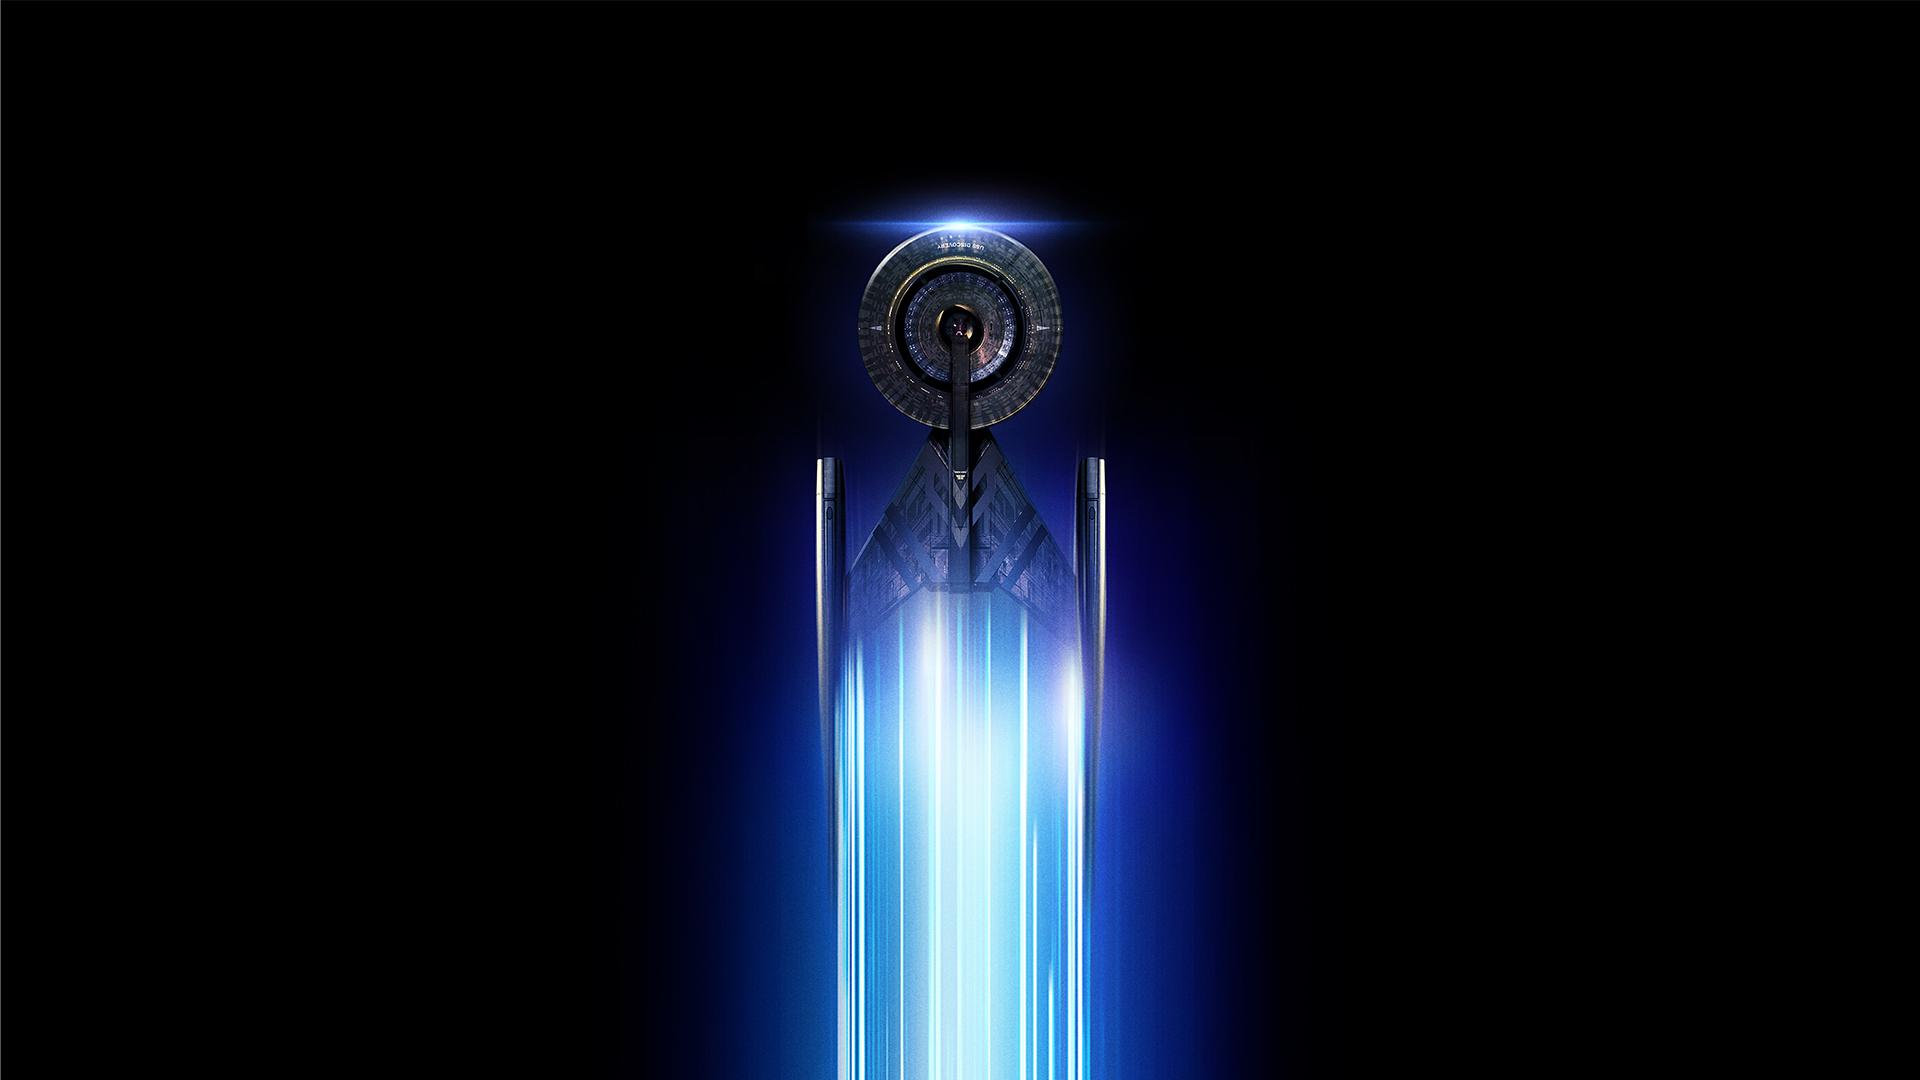 wallpaper : star trek, star trek discovery, science fiction, tv